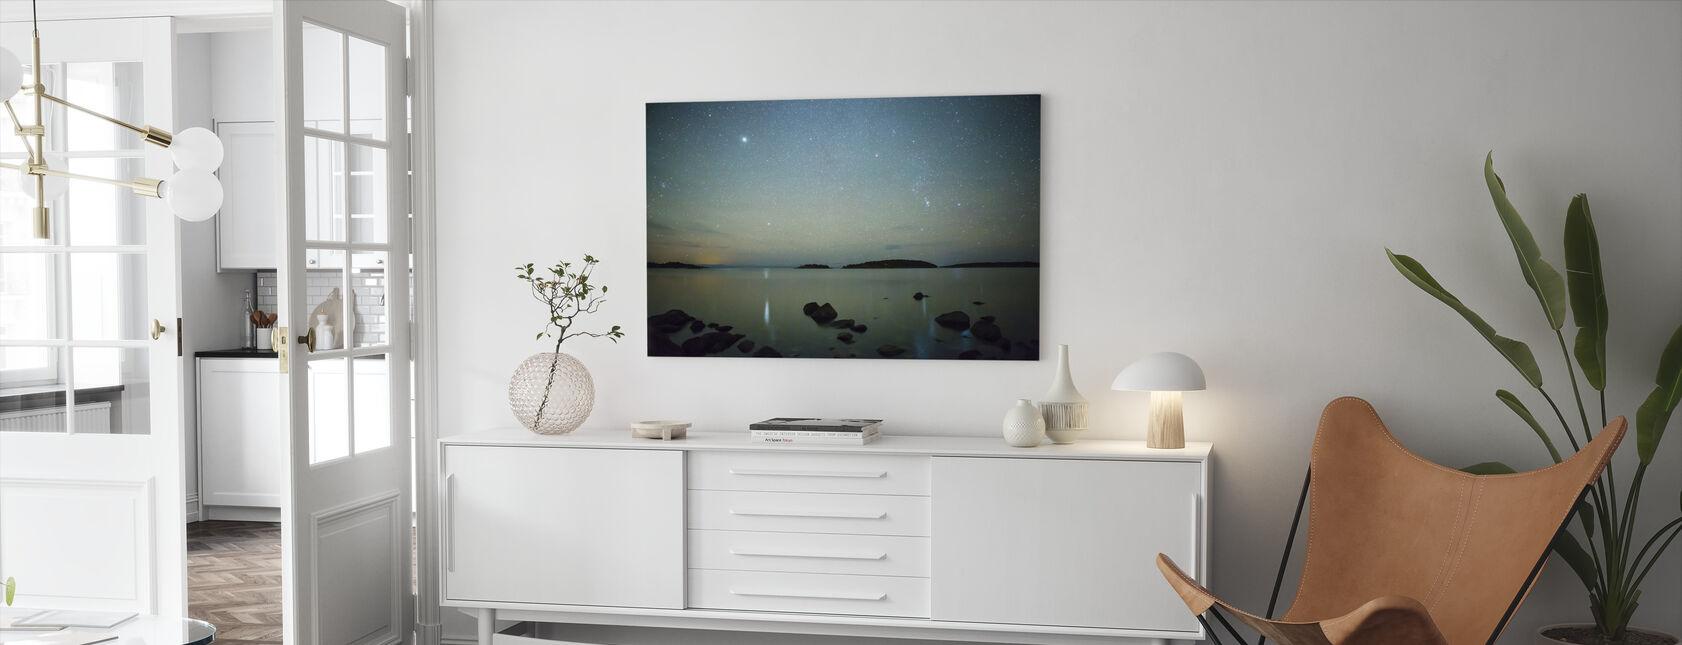 Starry Sky over Juniskär, Sweden - Canvas print - Living Room